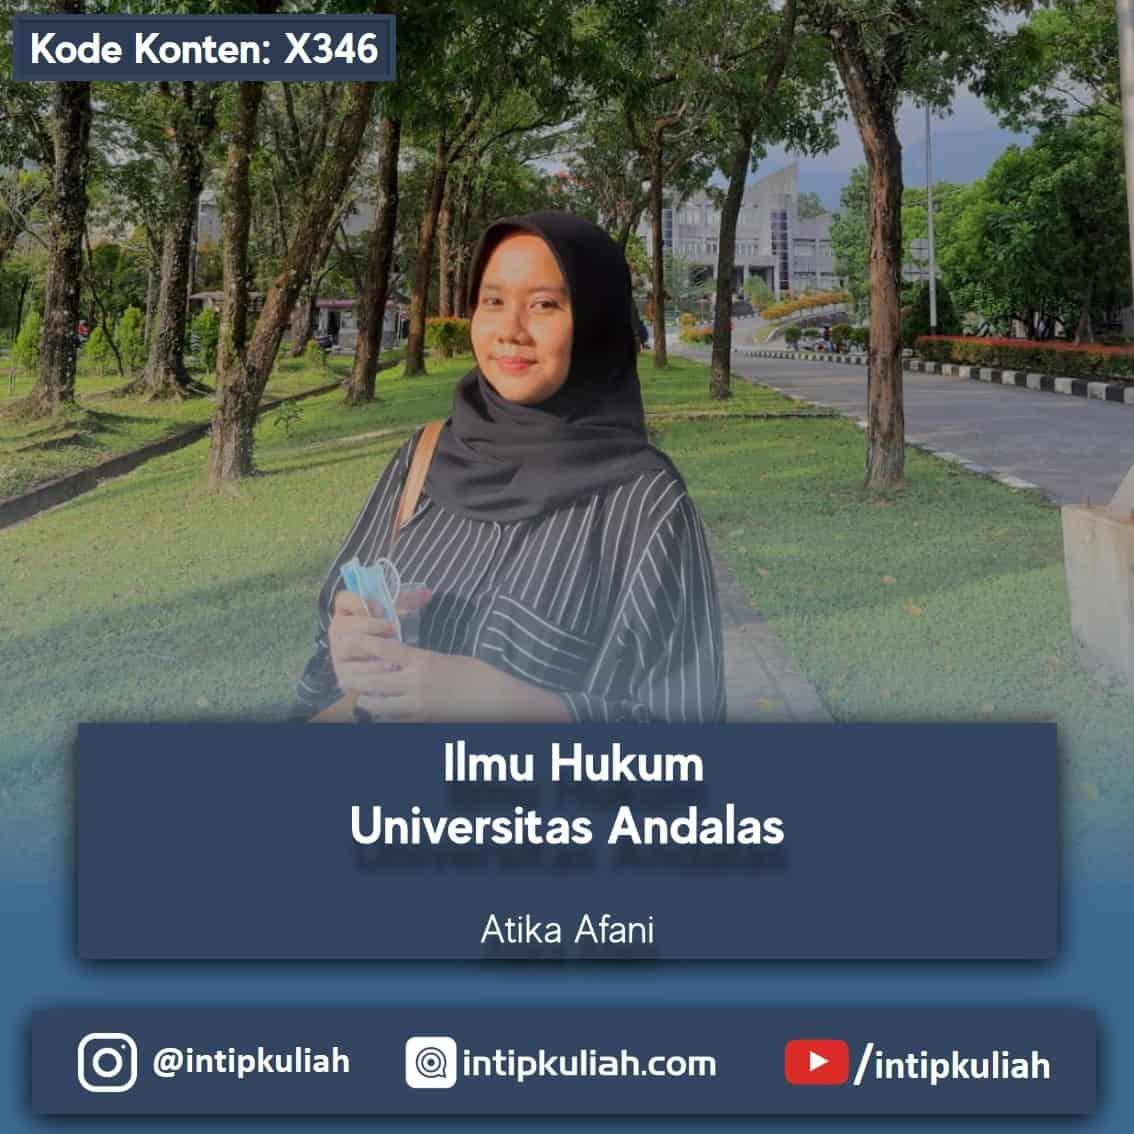 Ilmu Hukum Universitas Andalas (Atika)